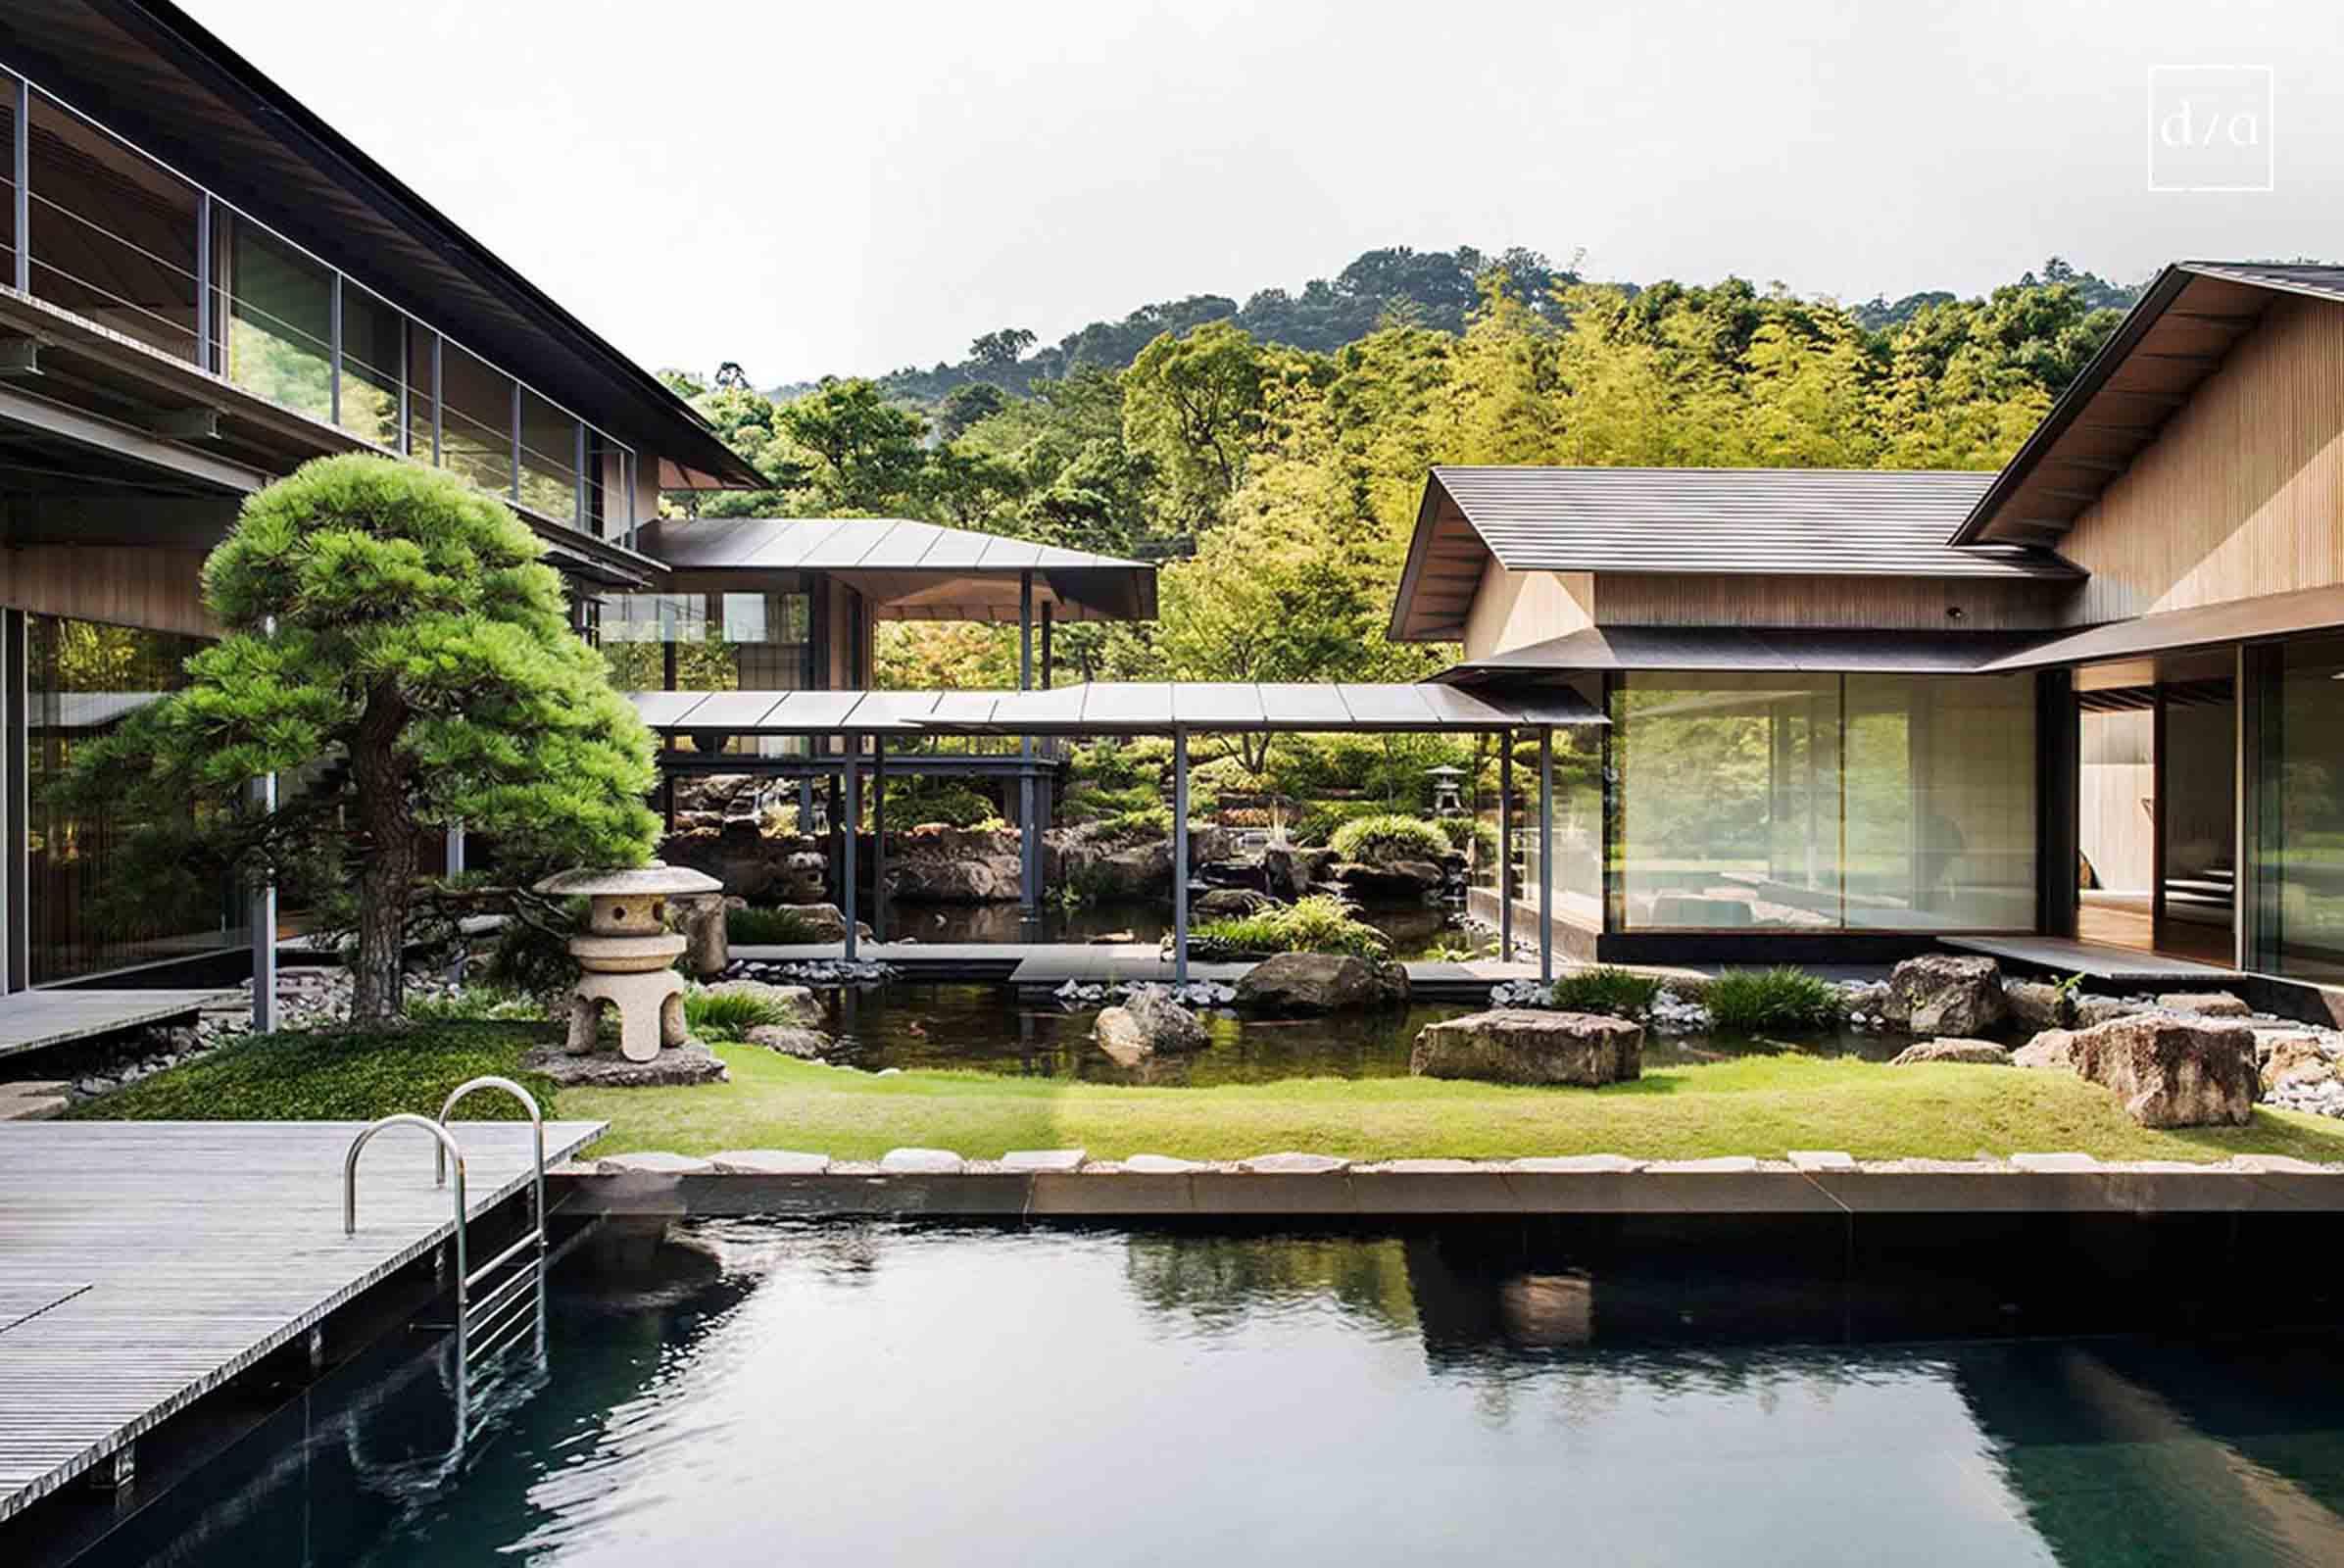 Japan home 6.jpg